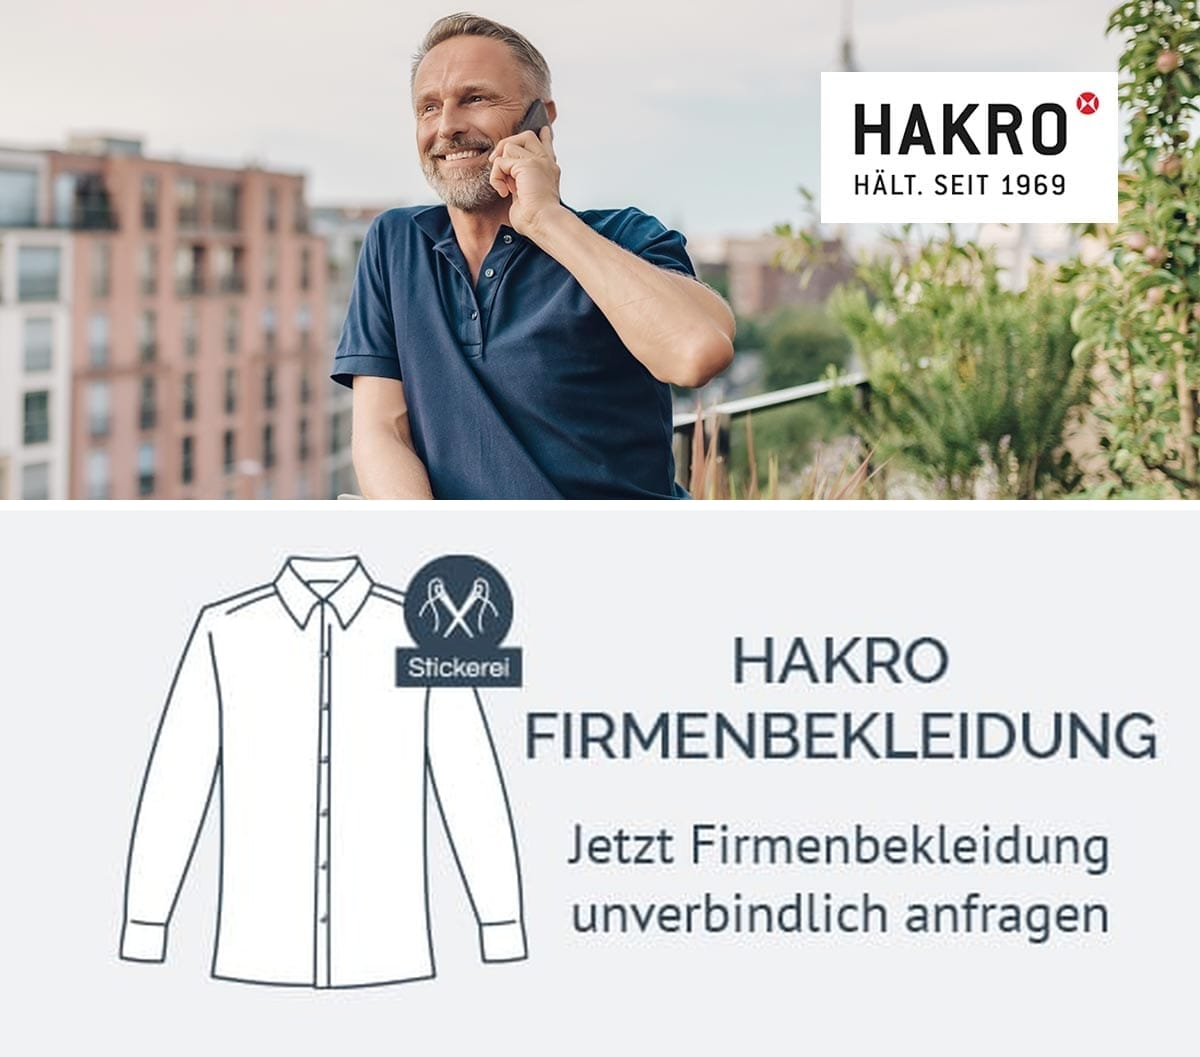 HAKRO 806 Firmenbekleidung anfragen